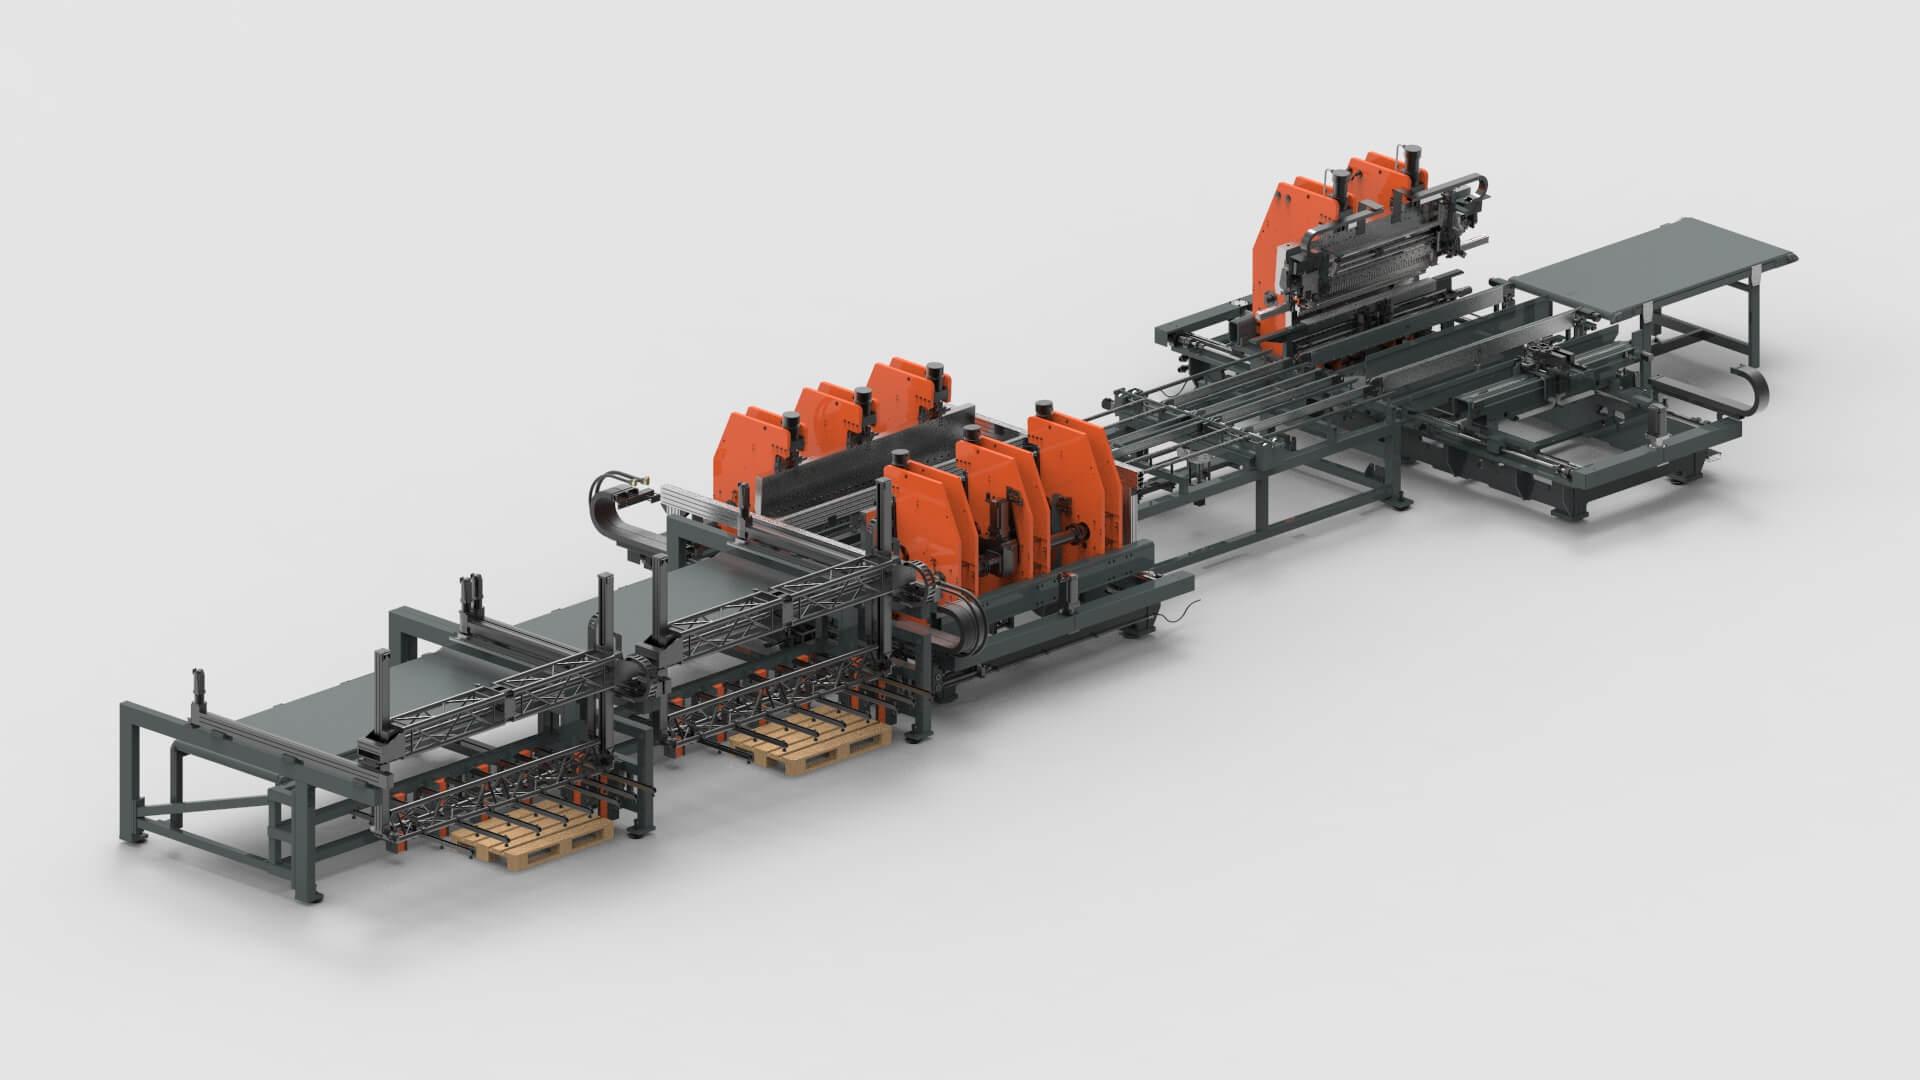 wemo-steel-doors-sheet-metal-bending-production-line.jpg